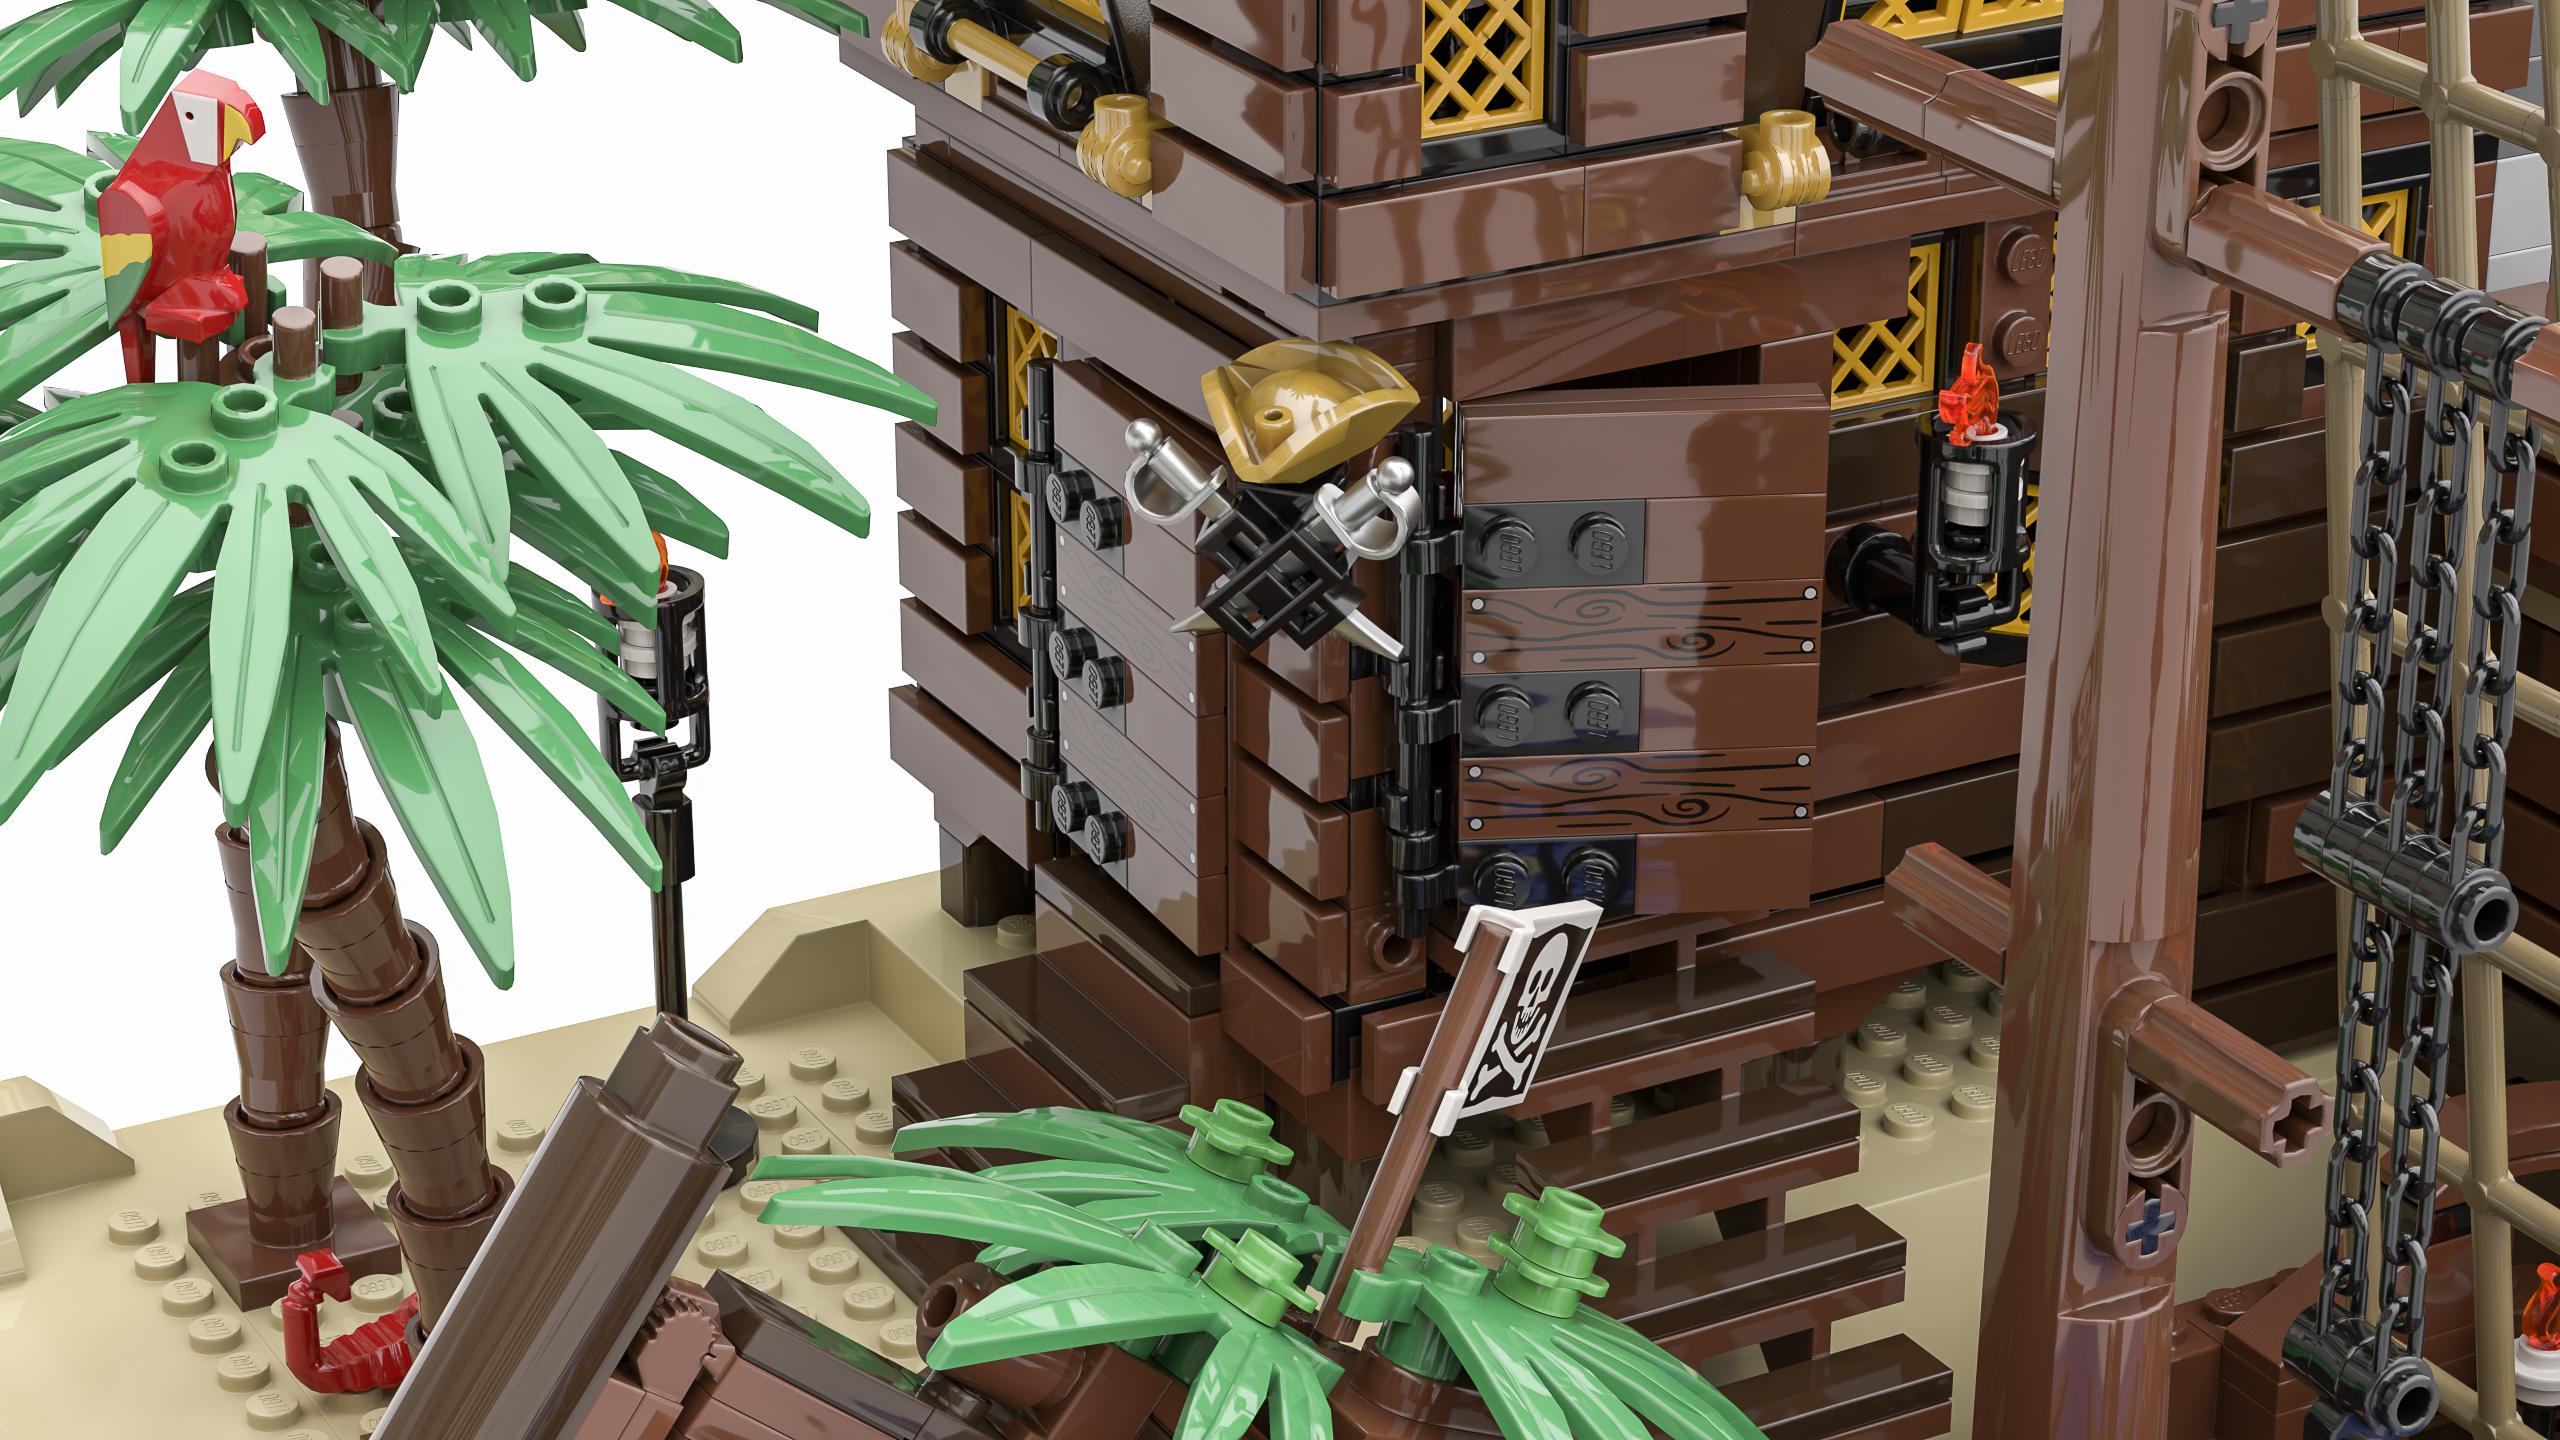 LEGO piraten set